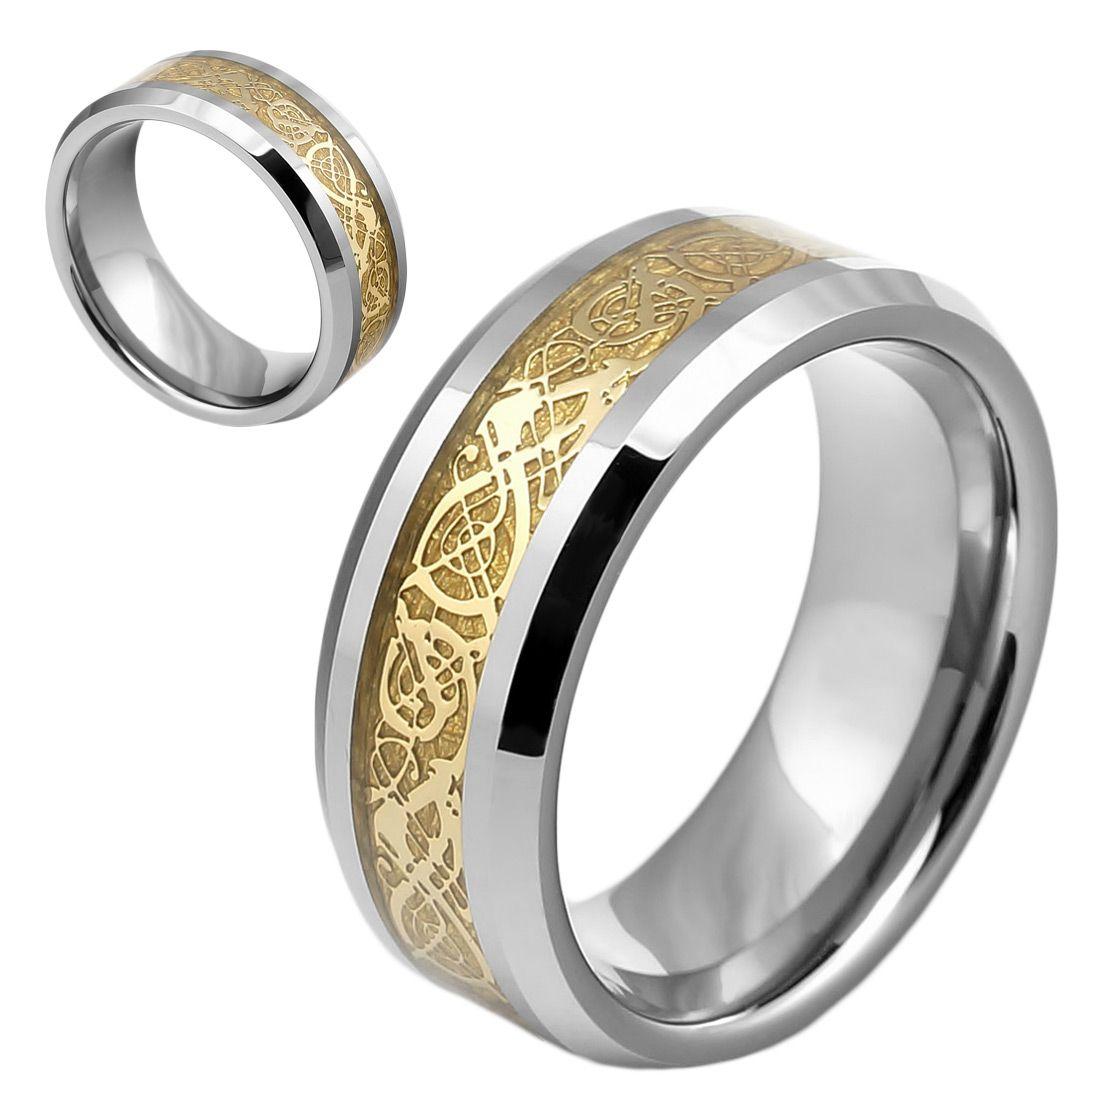 Herren Ringe Keltisch